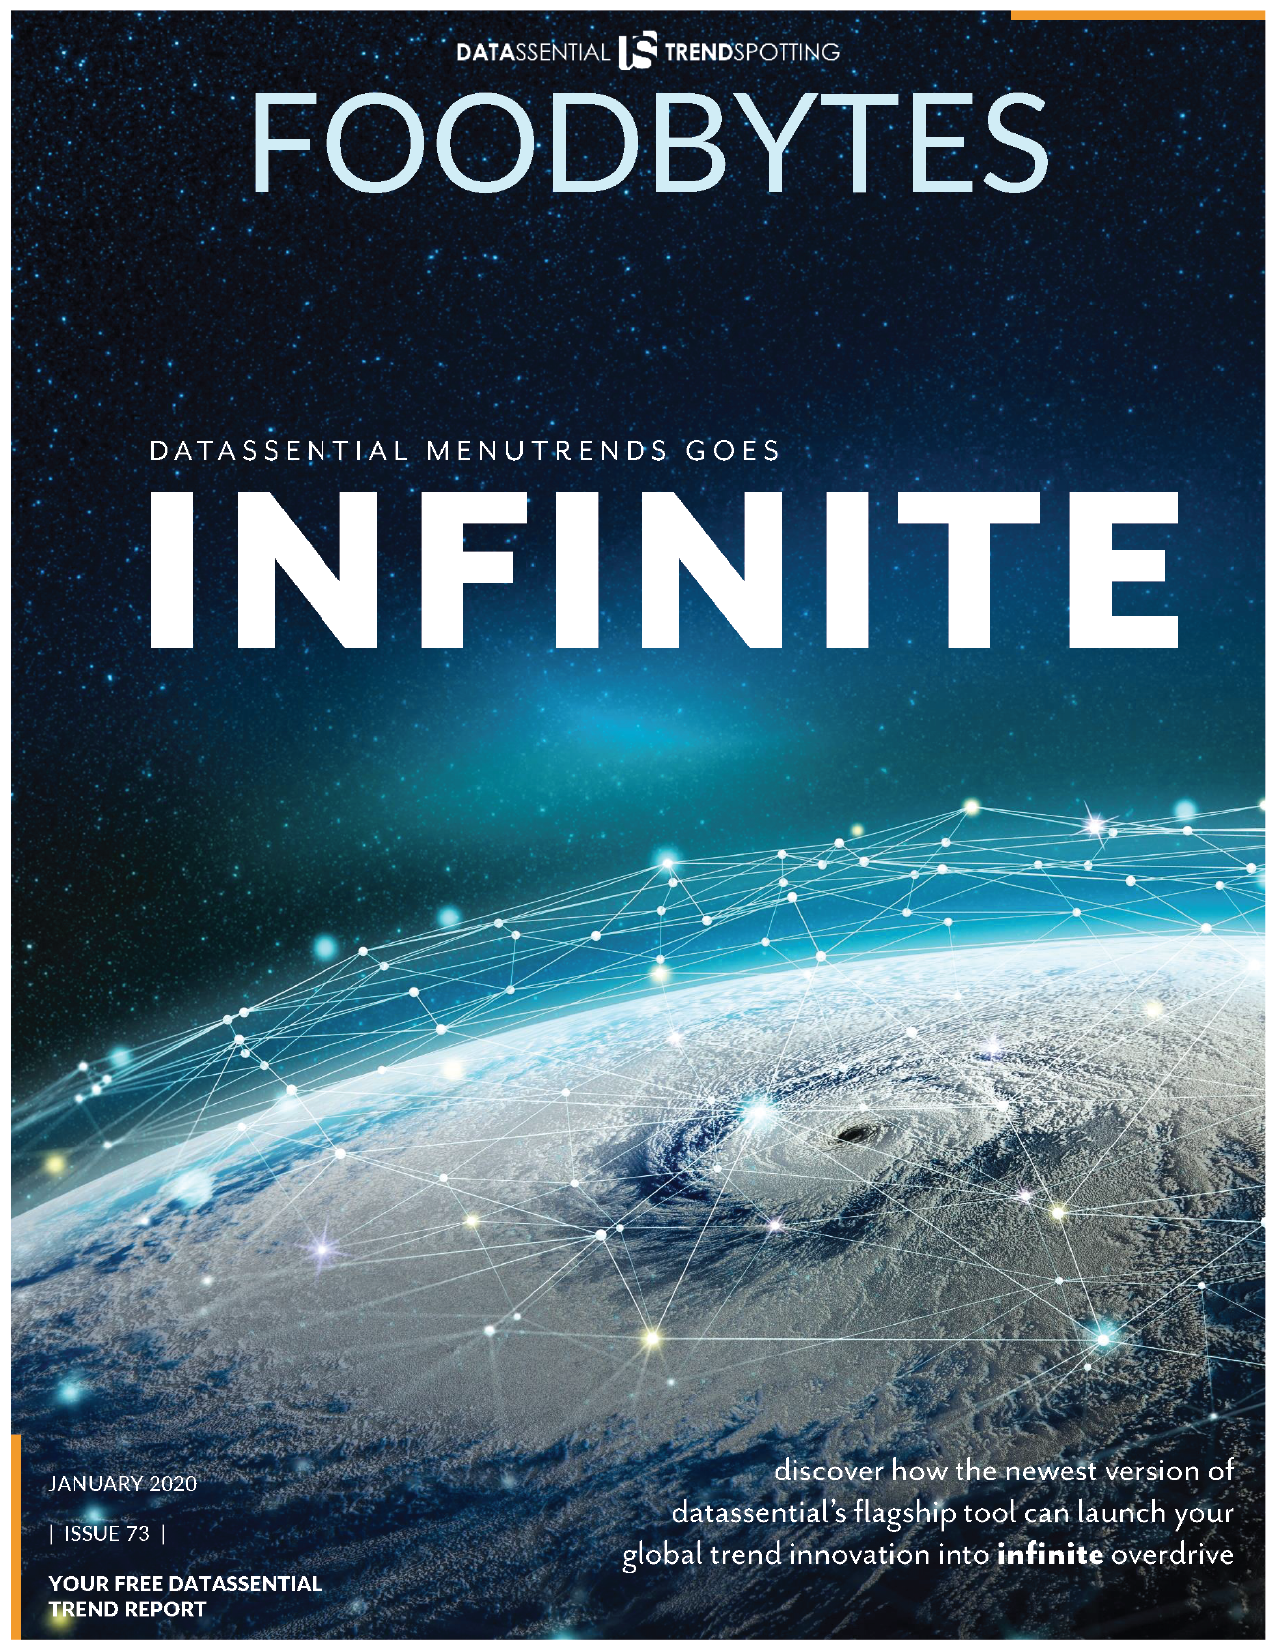 Datassential MenuTrends Infinite